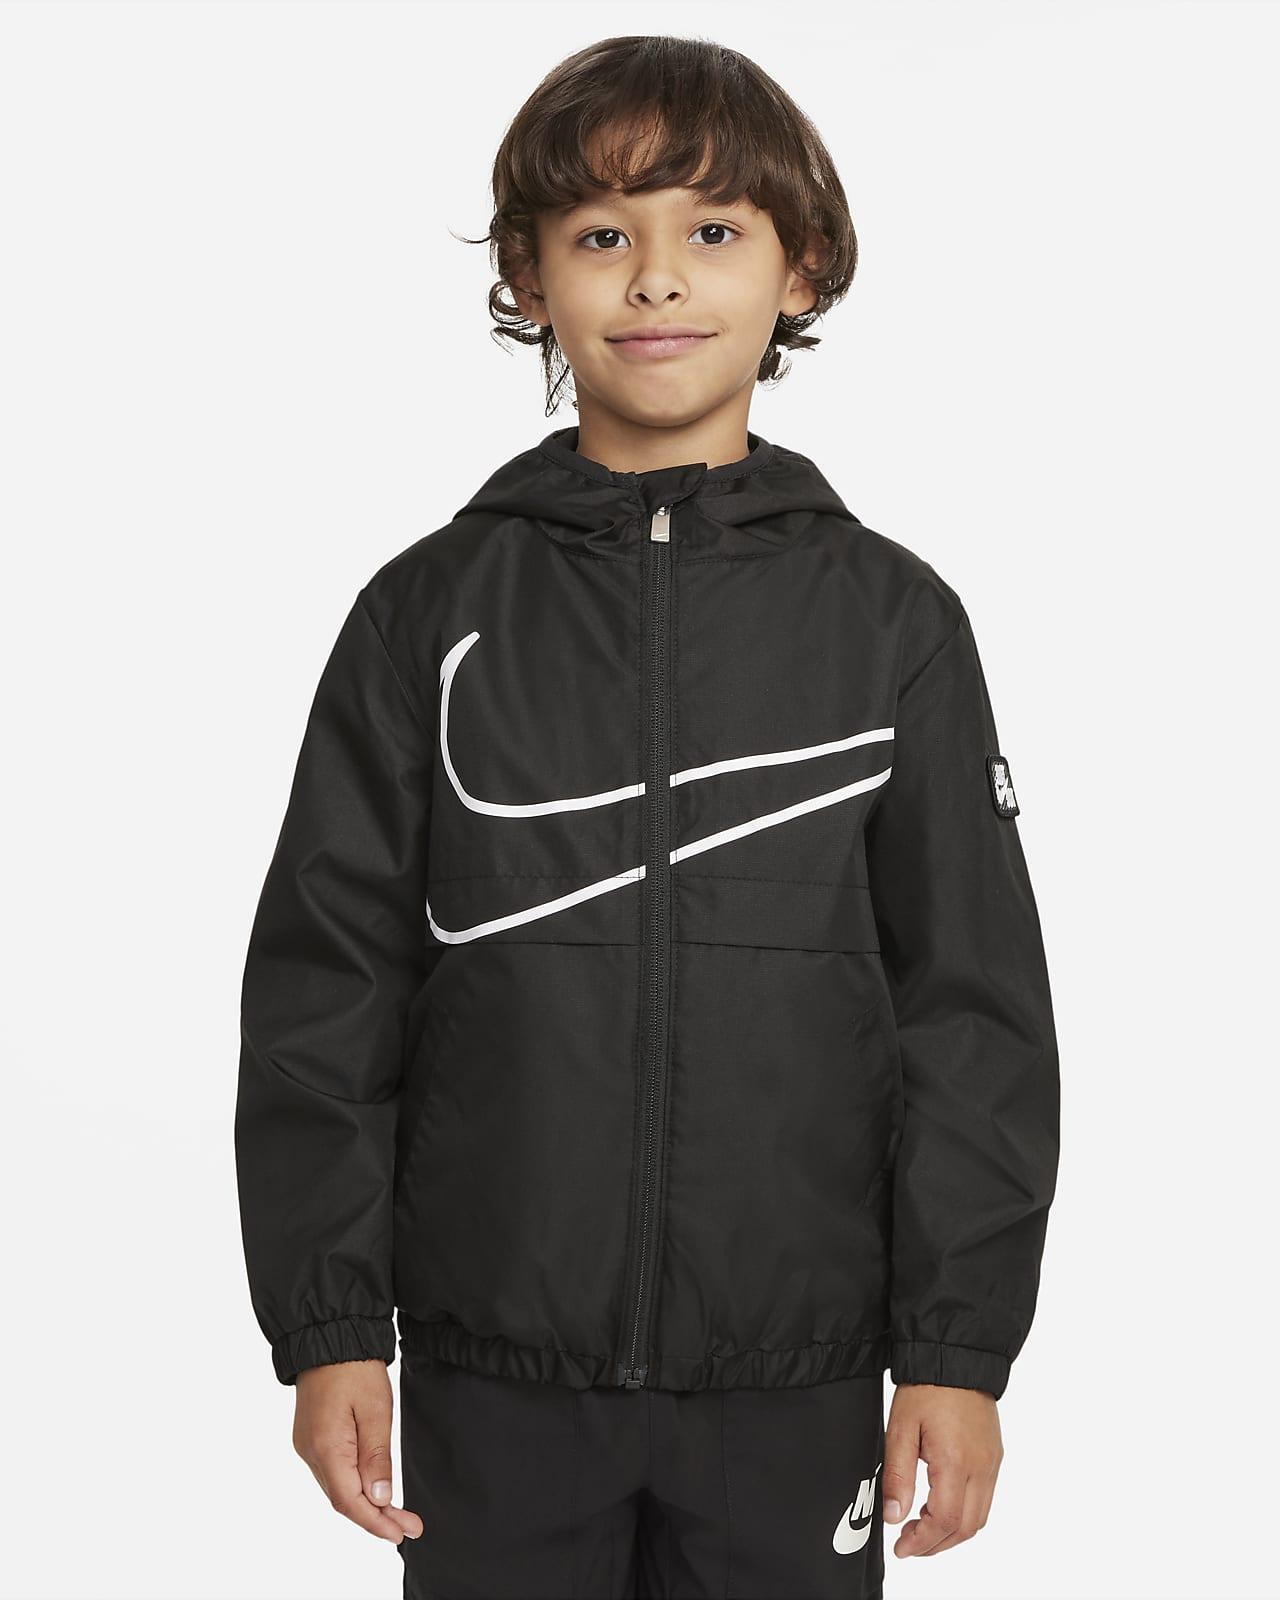 Nike Sportswear Windrunner Younger Kids' Full-Zip Jacket